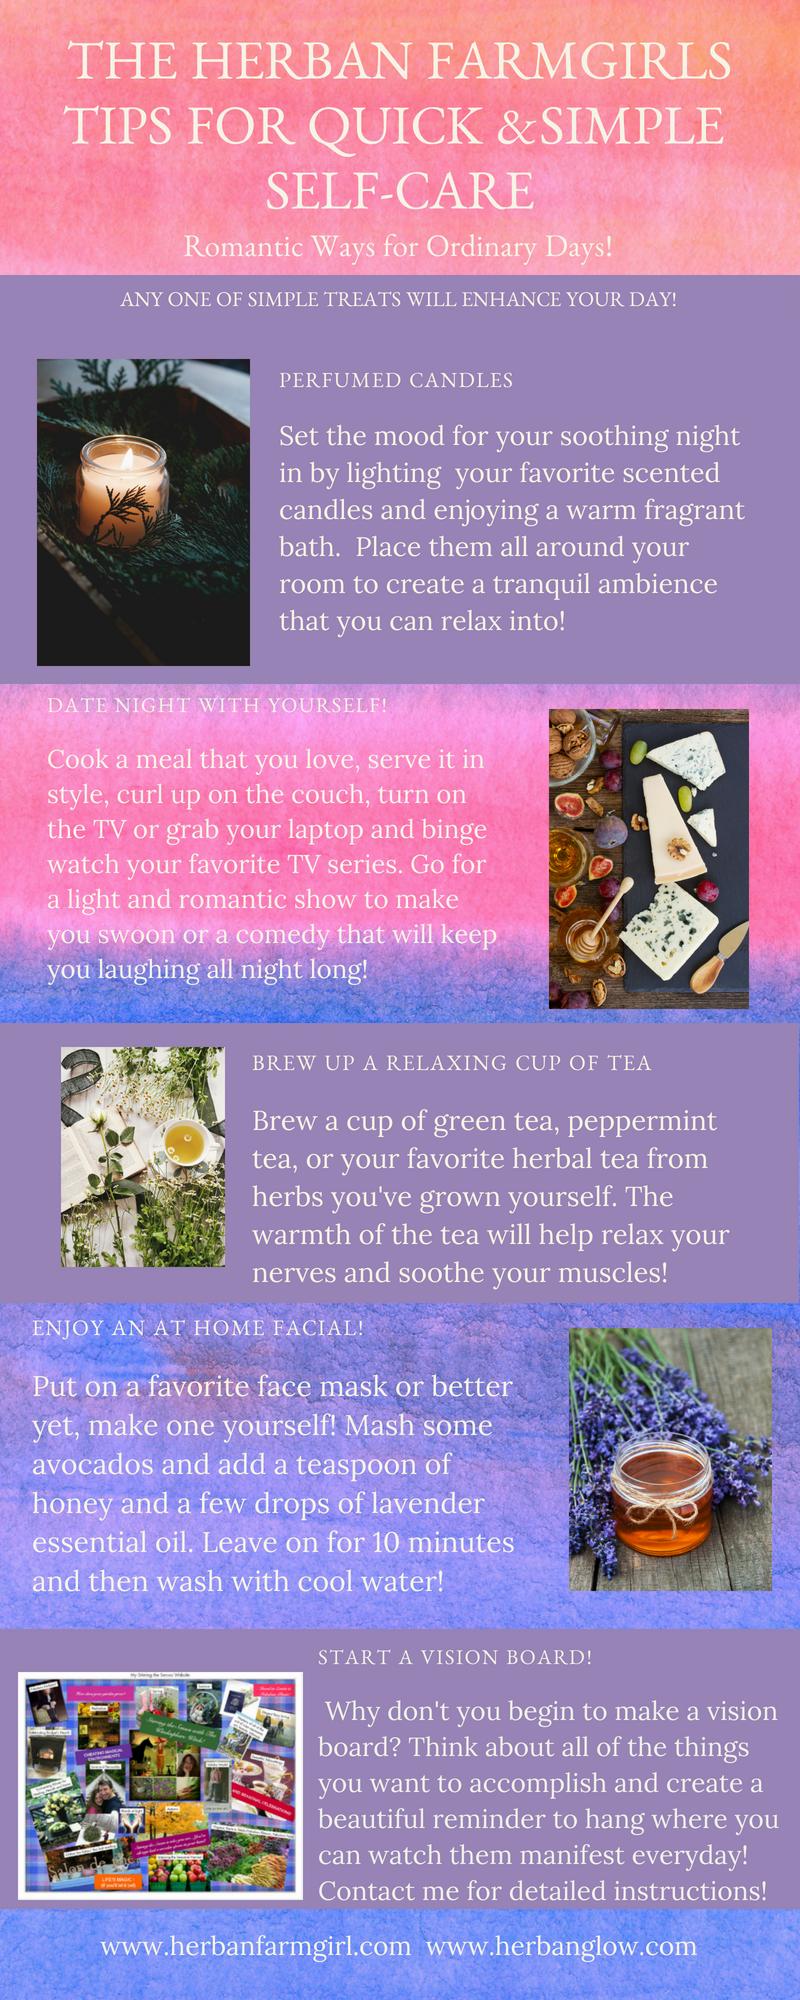 The Herban Farmgirls Guide to Self-Care (2)